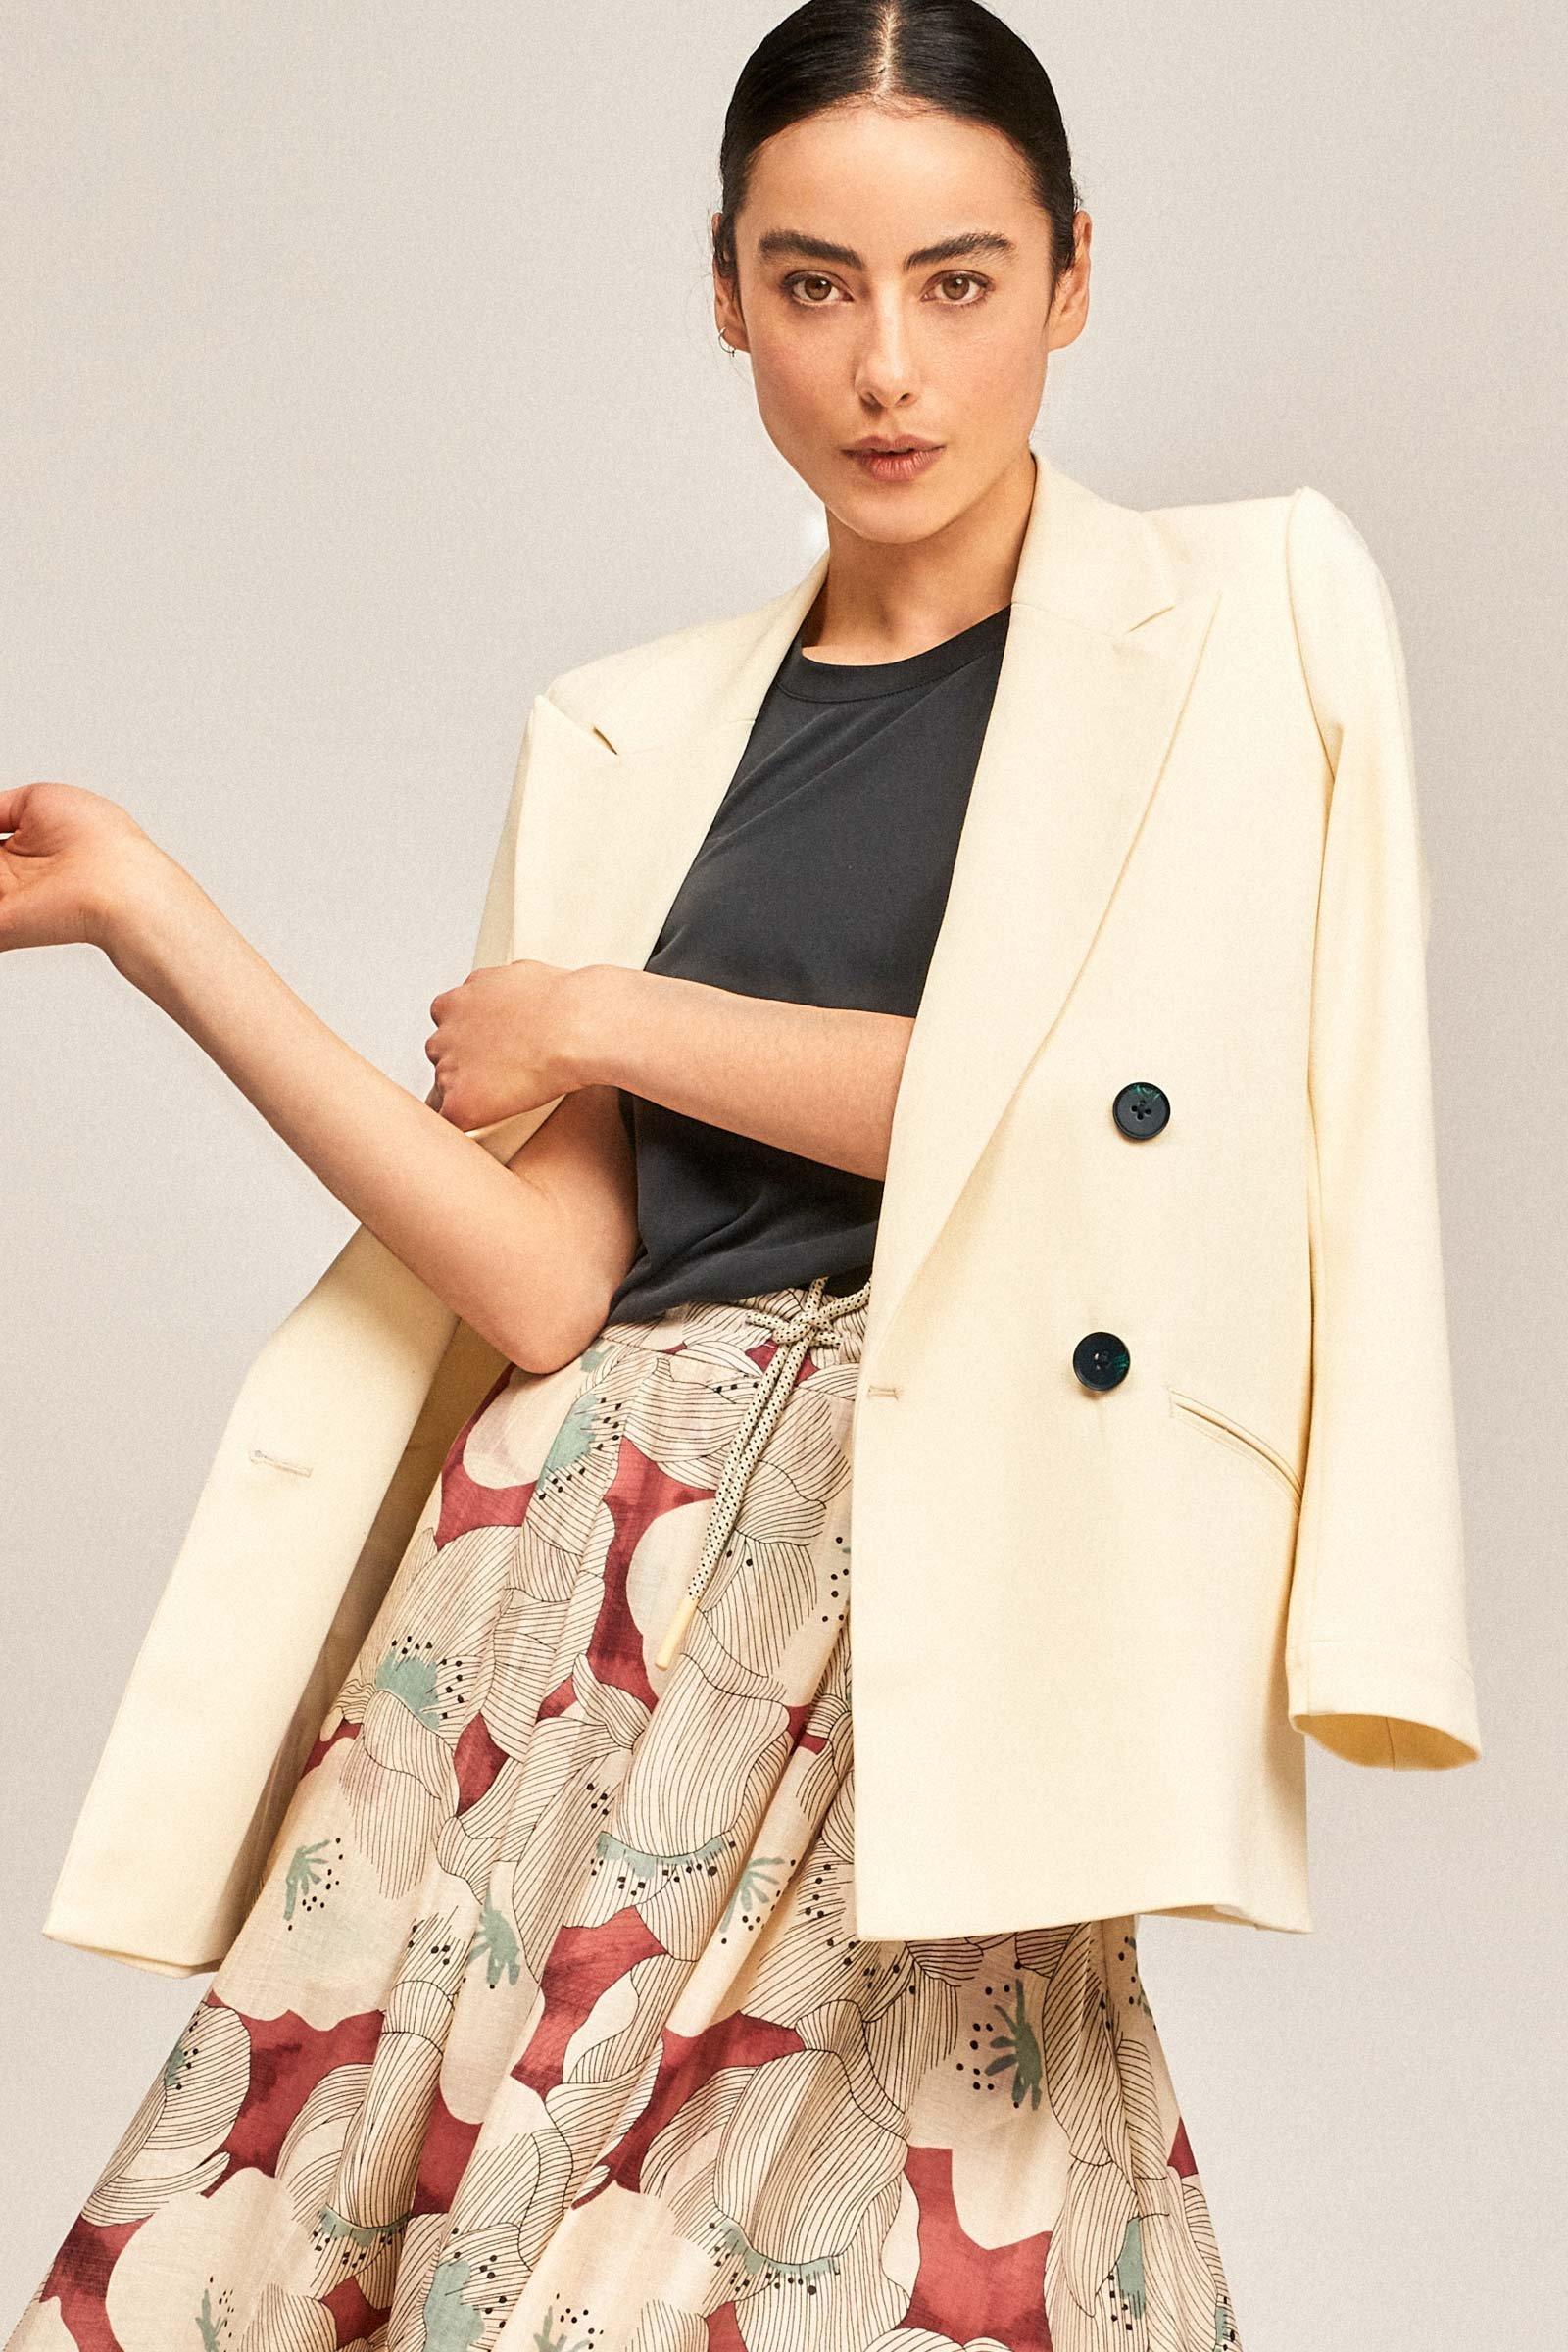 https://webmedia.cks-fashion.com/i/cks/123366ASM_10_l_model